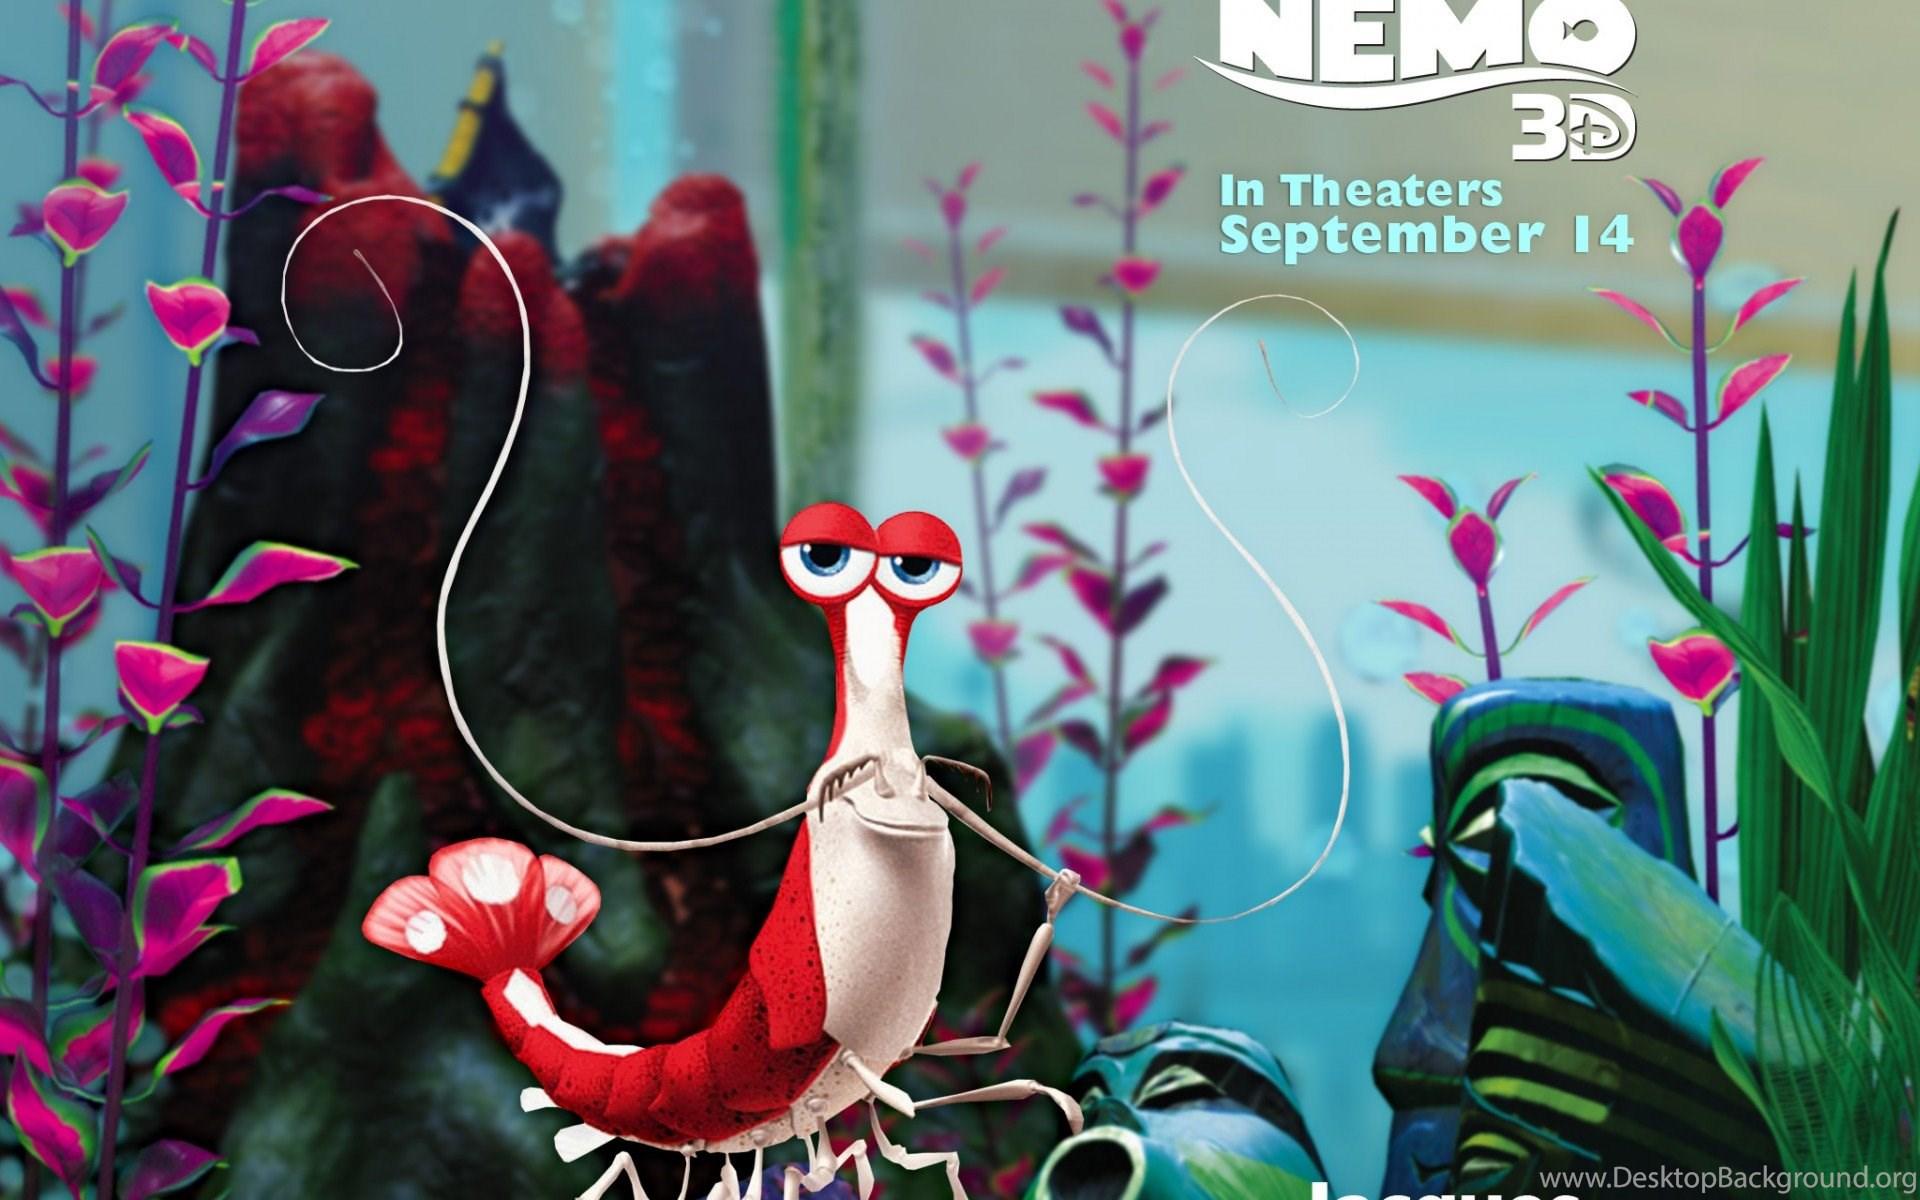 Download 1920x1200 Finding Nemo 3d Wallpapers Jacques Desktop Background